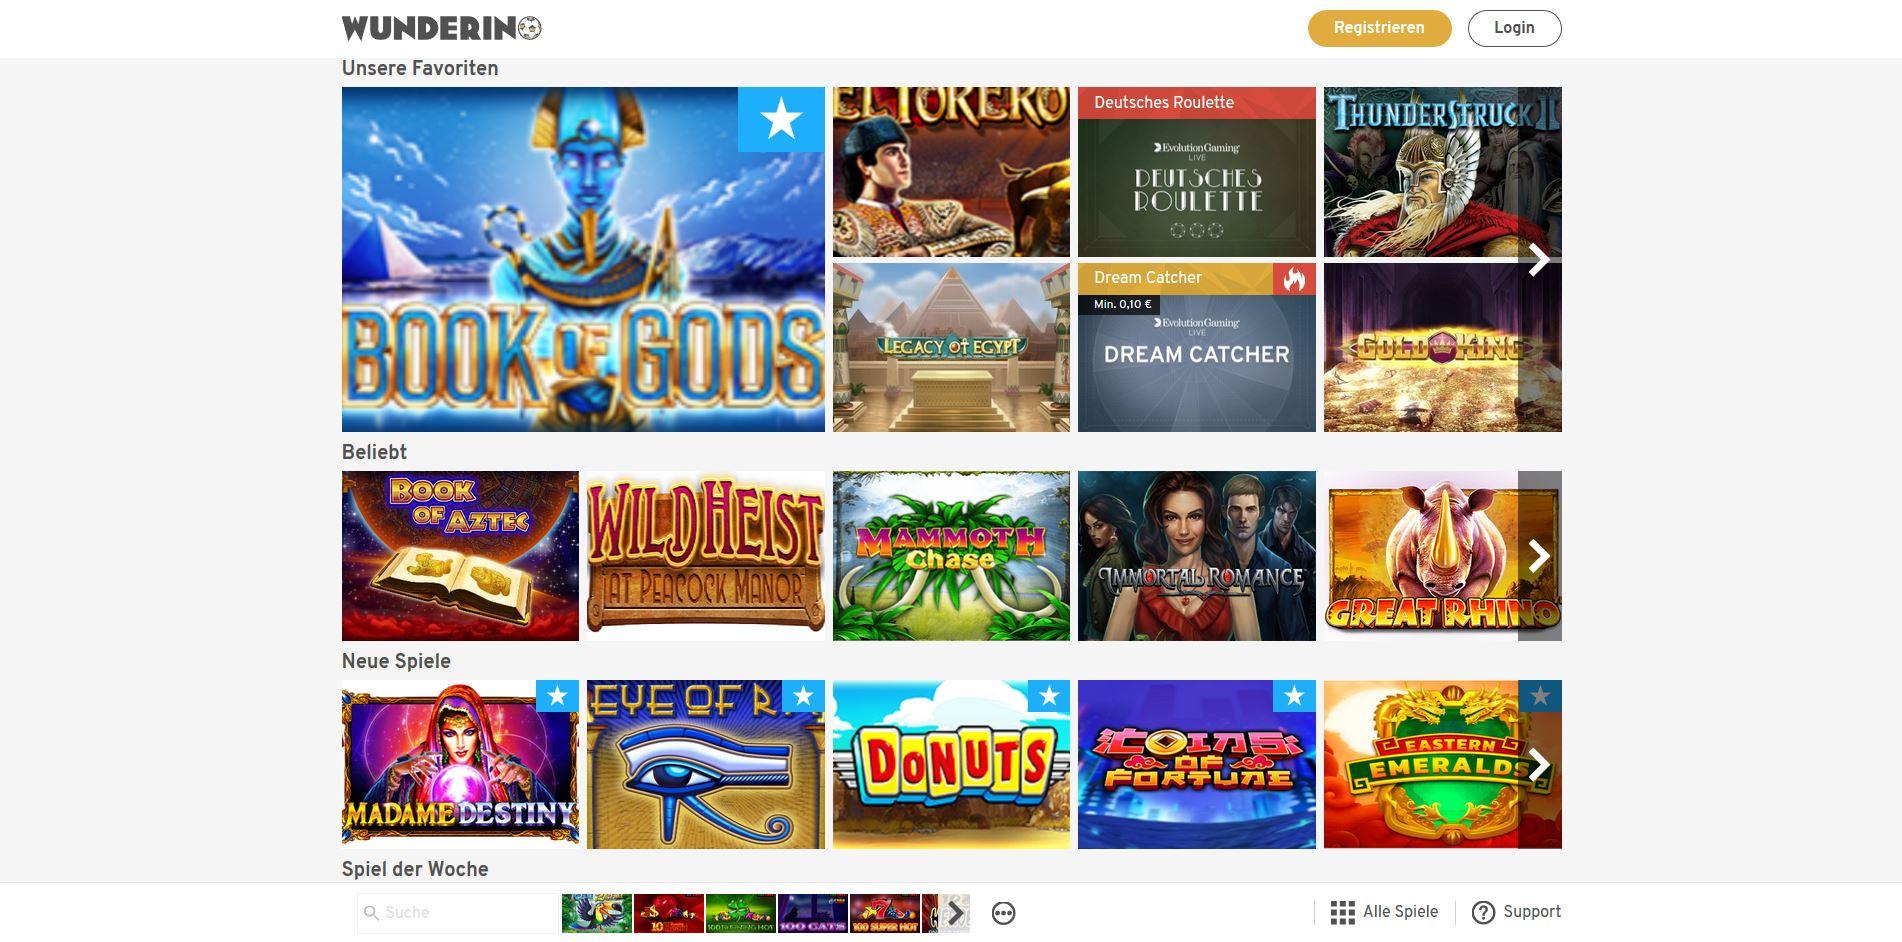 Lucky creek casino no deposit bonus codes 2020